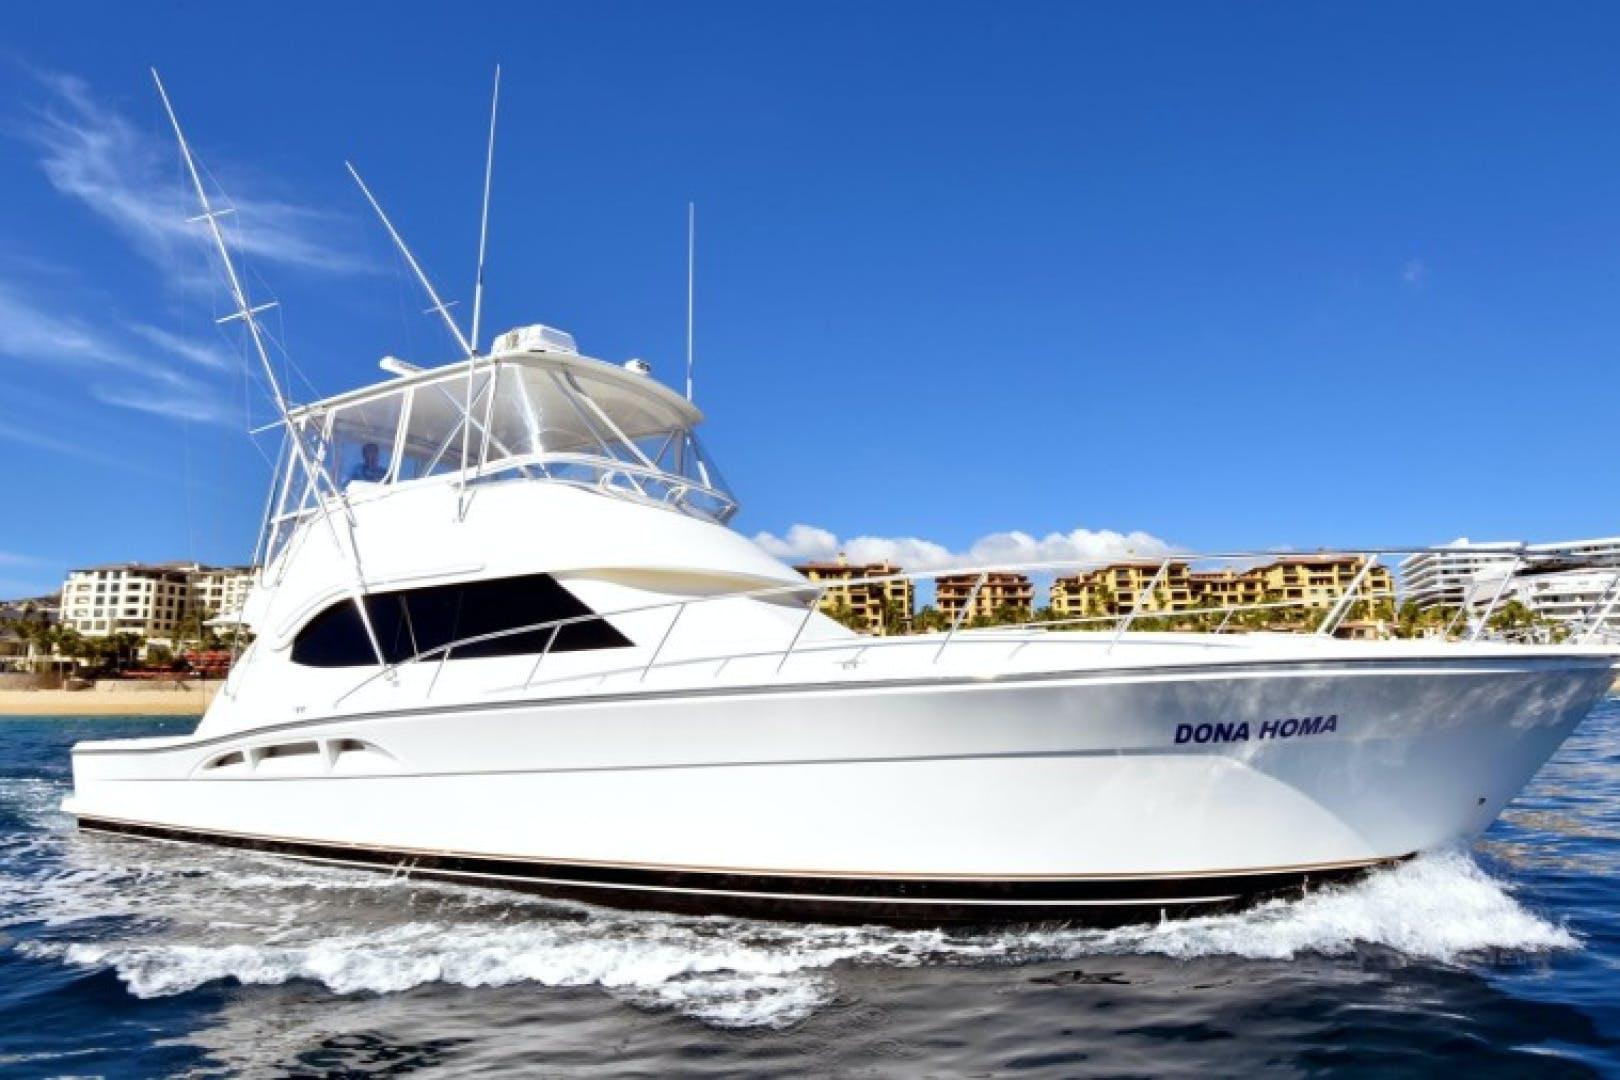 2005 Riviera 51' 51 Convertible Dona Homa  | Picture 1 of 36